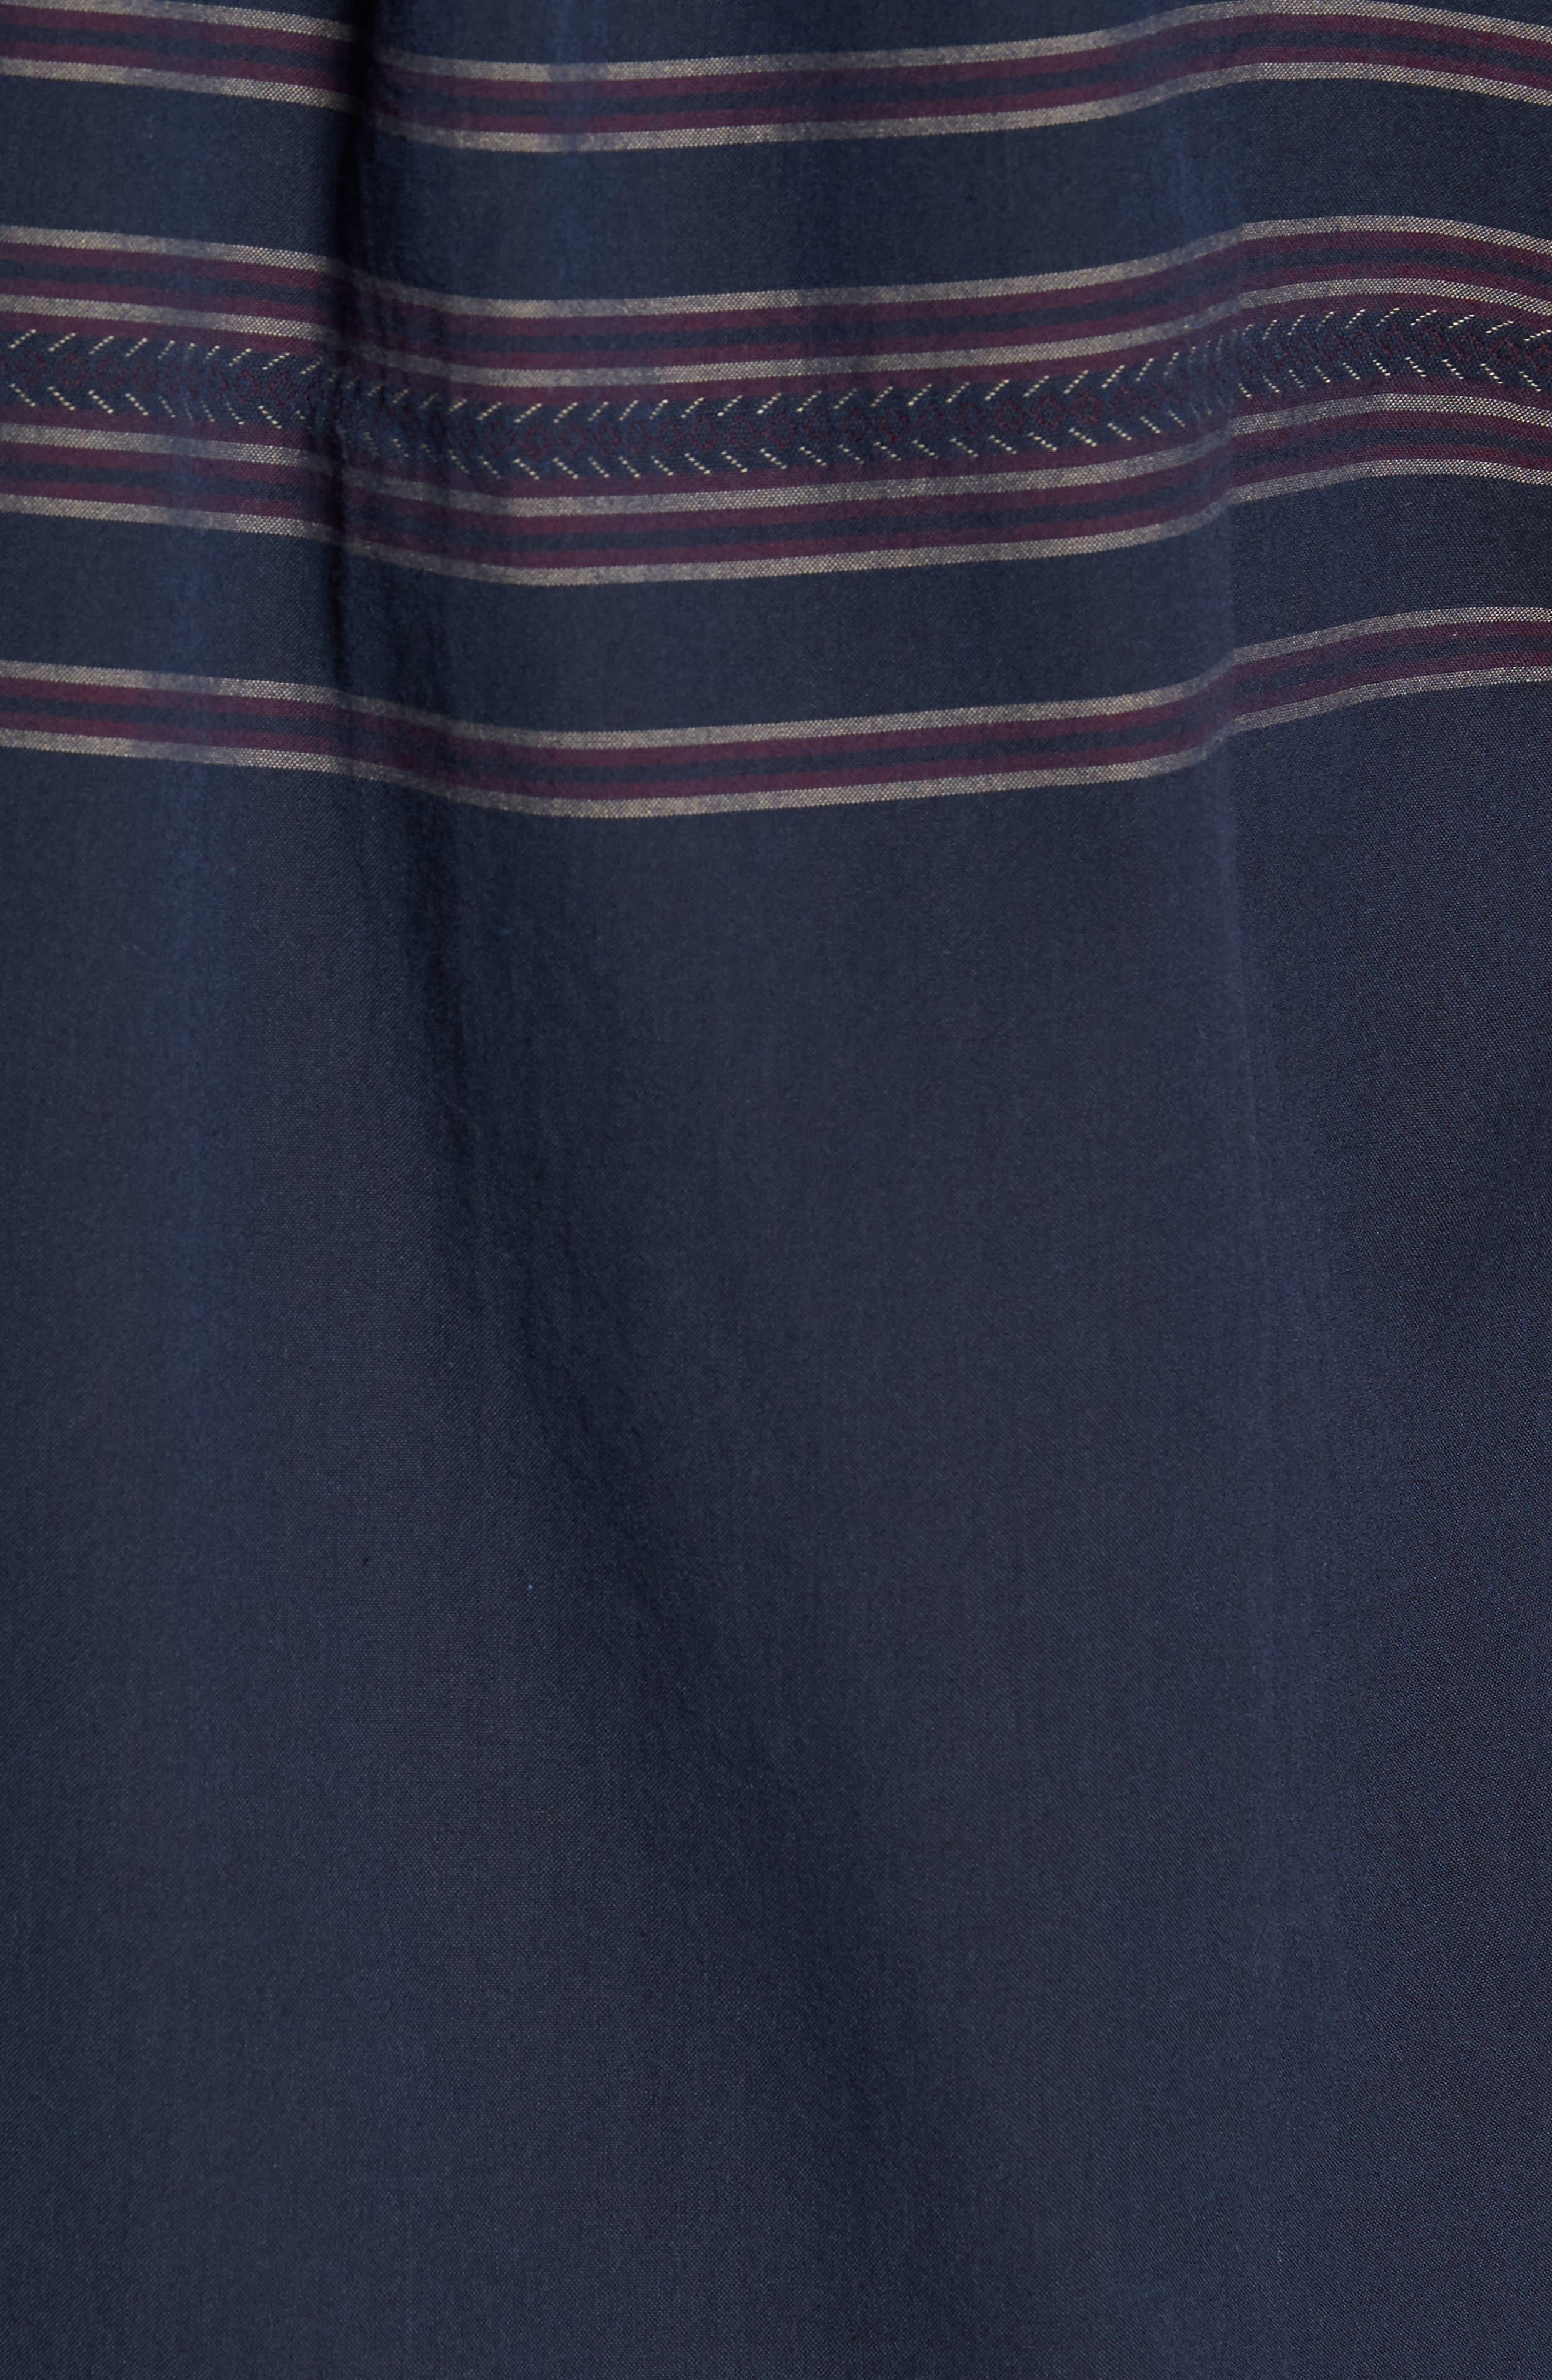 Alternate Image 5  - Vans Benmore Striped Woven Shirt